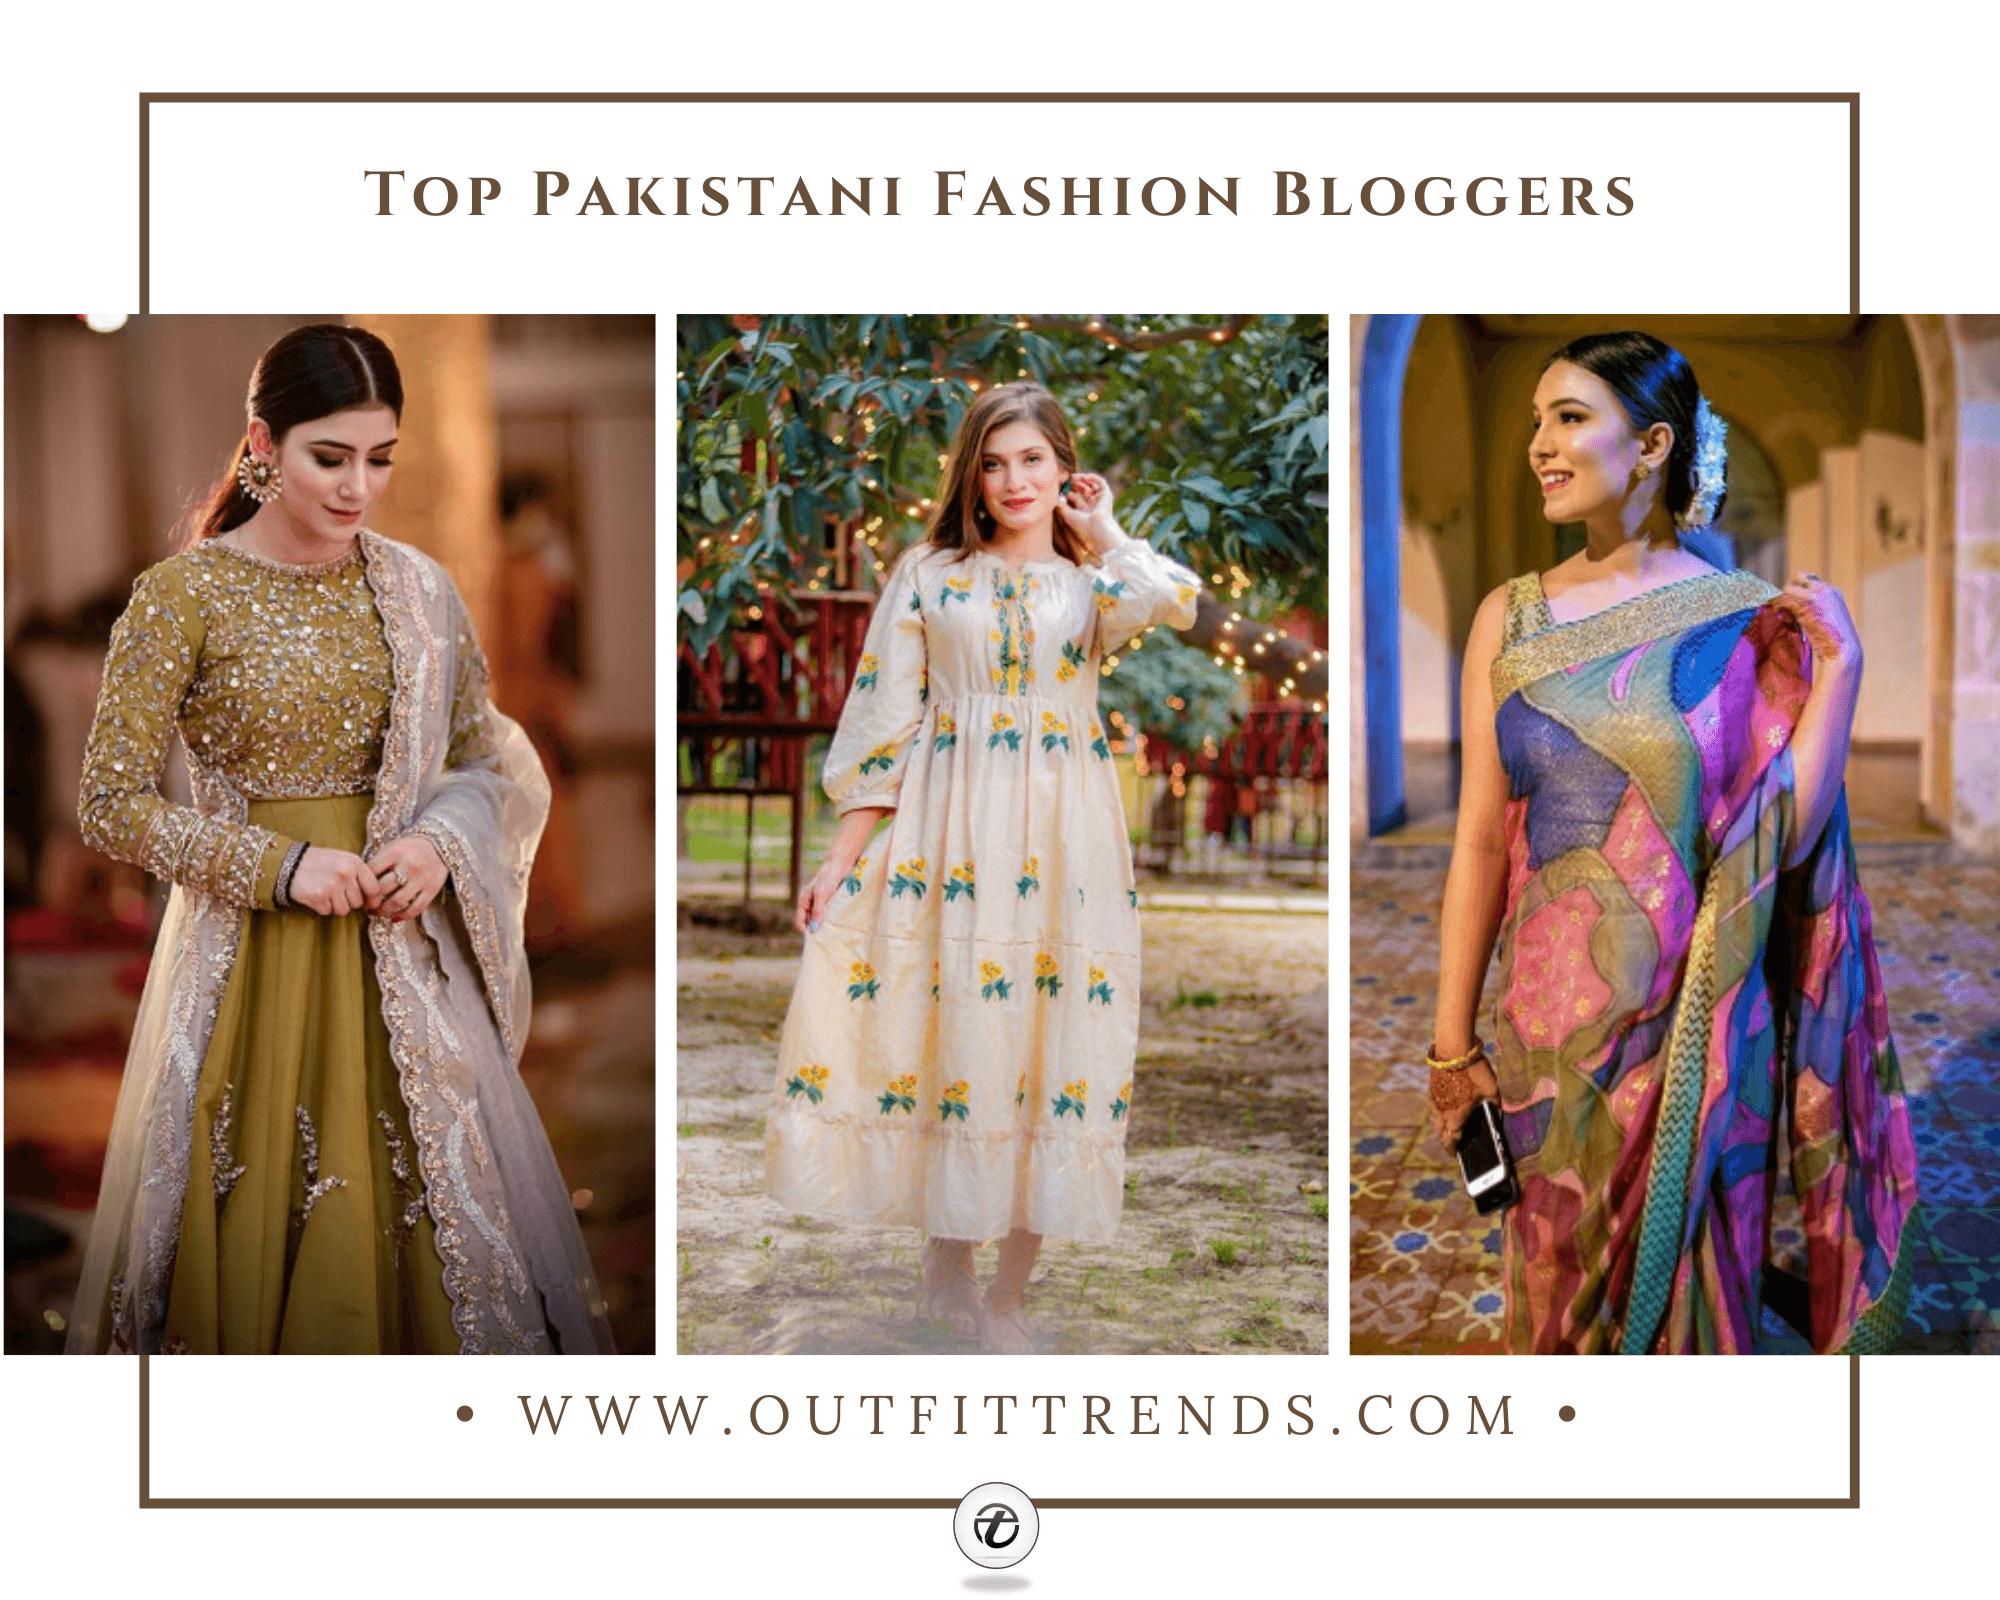 Top 22 Pakistani Fashion Bloggers Every Girl Should Follow